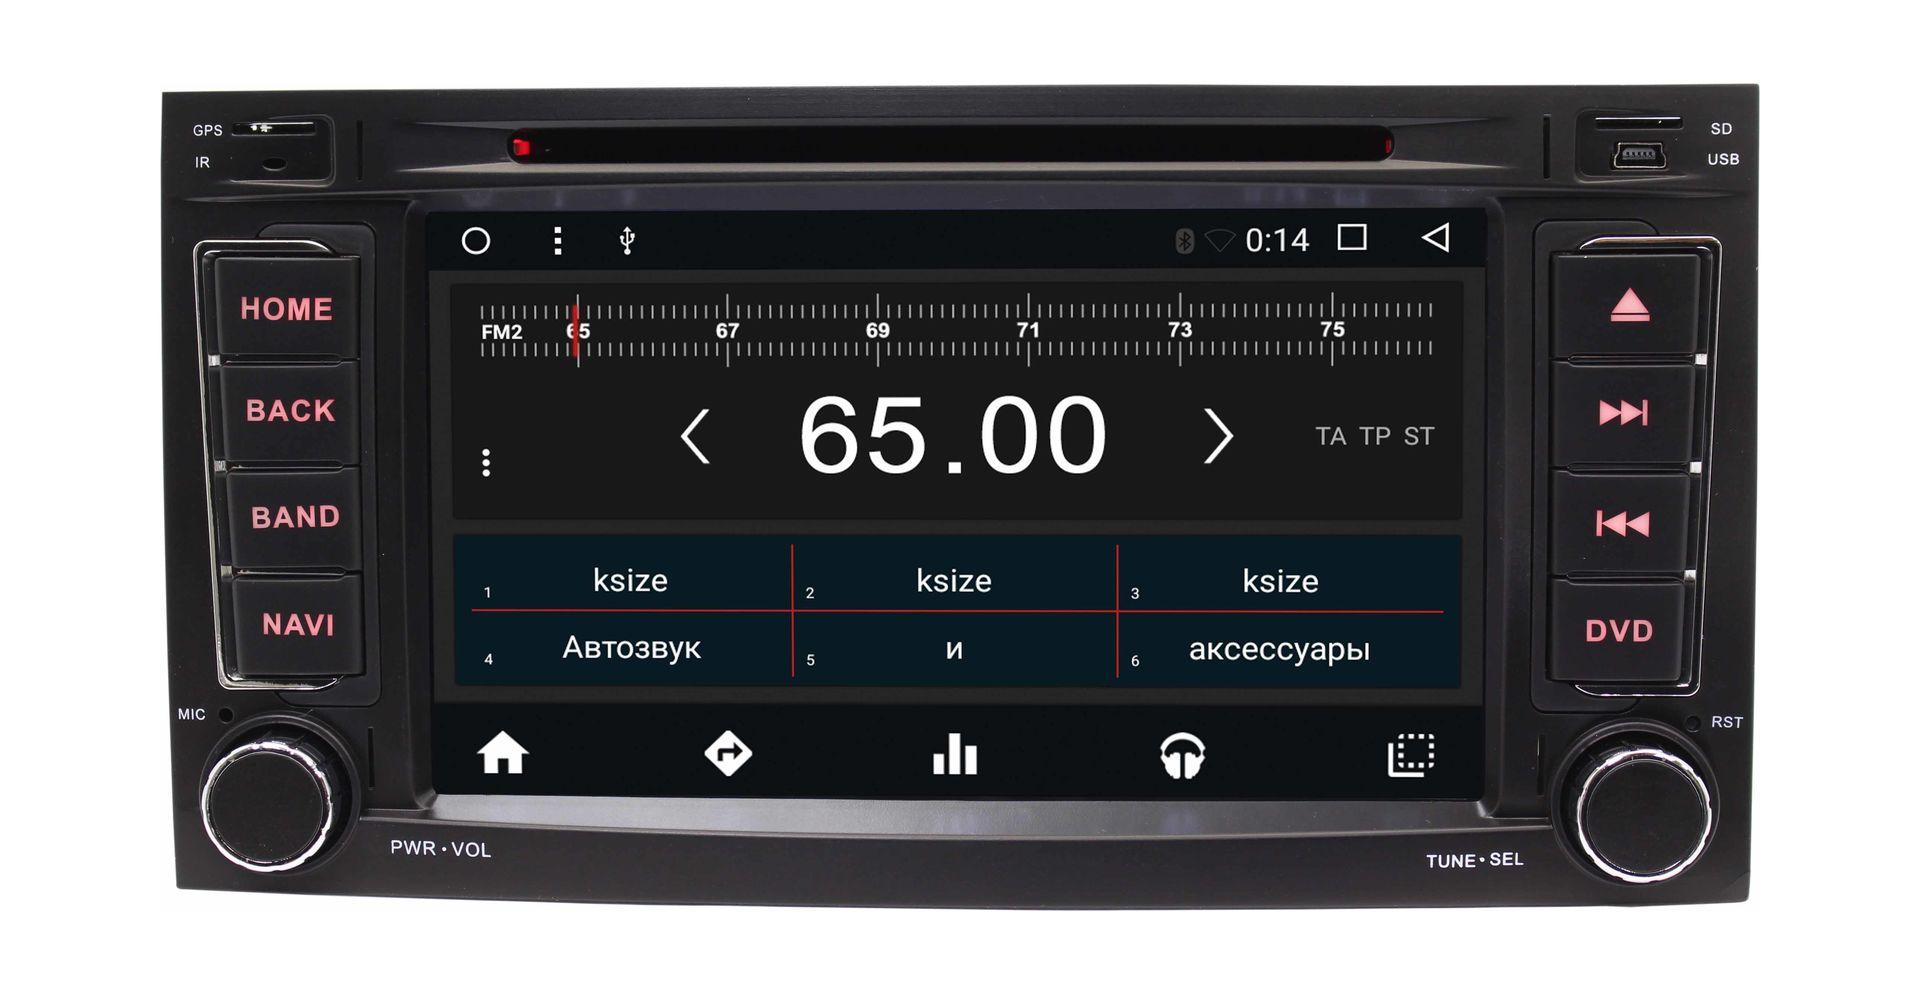 Штатная магнитола Wide Media WM-VS7A808MA для Volkswagen Touareg, Multivan T5 2003-2015 Android 6.0.1